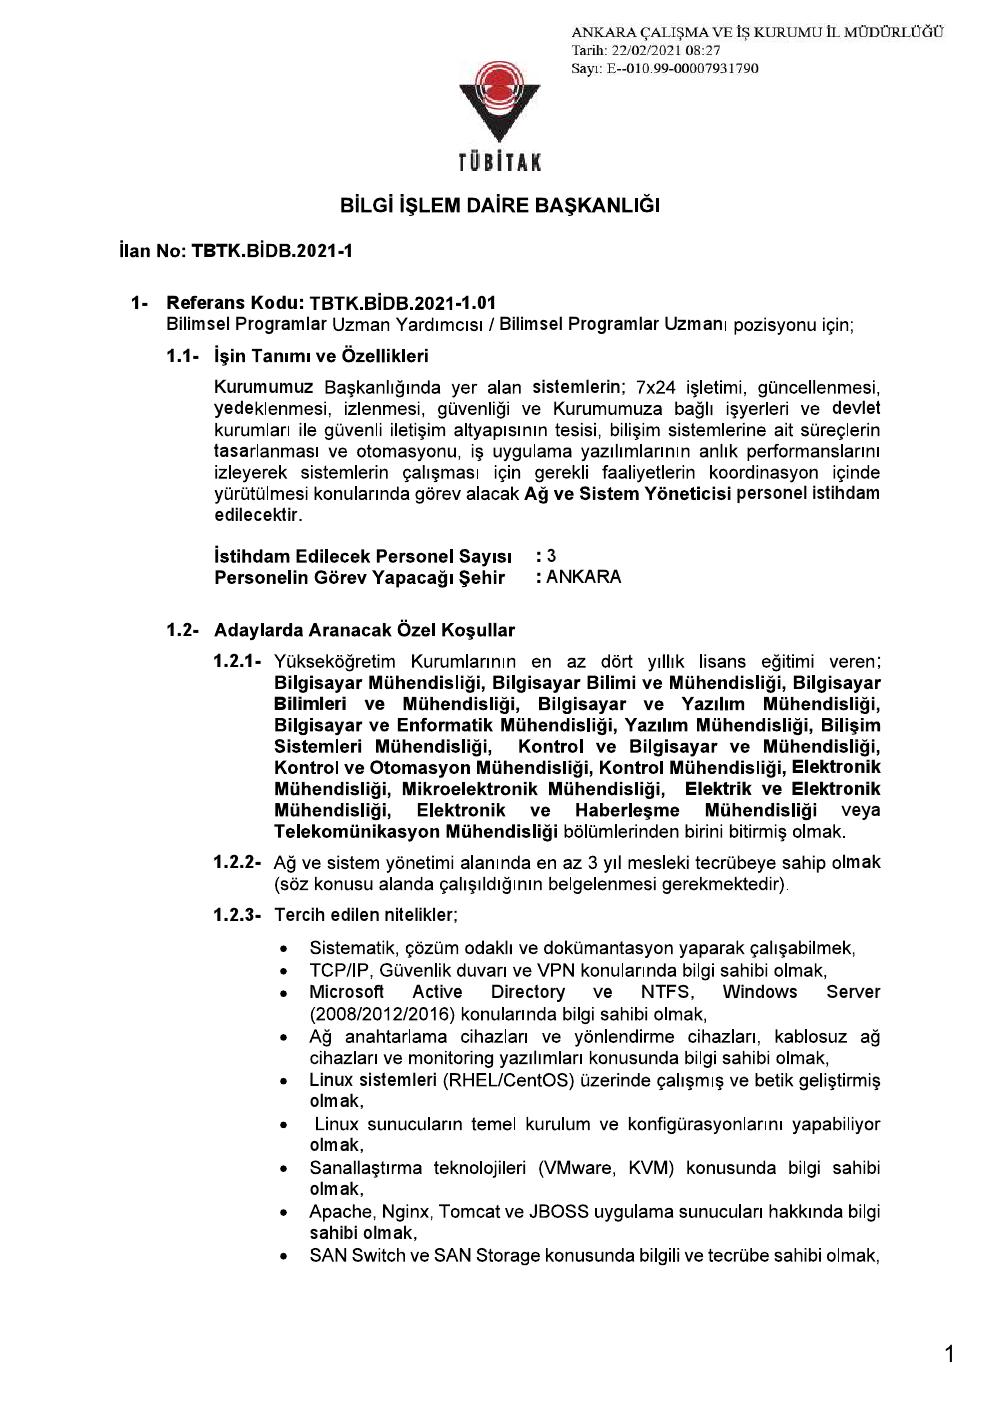 ankara-tubitak-bilgi-isl-daire-bask-pers-alimi-22-03-2021-000002.png